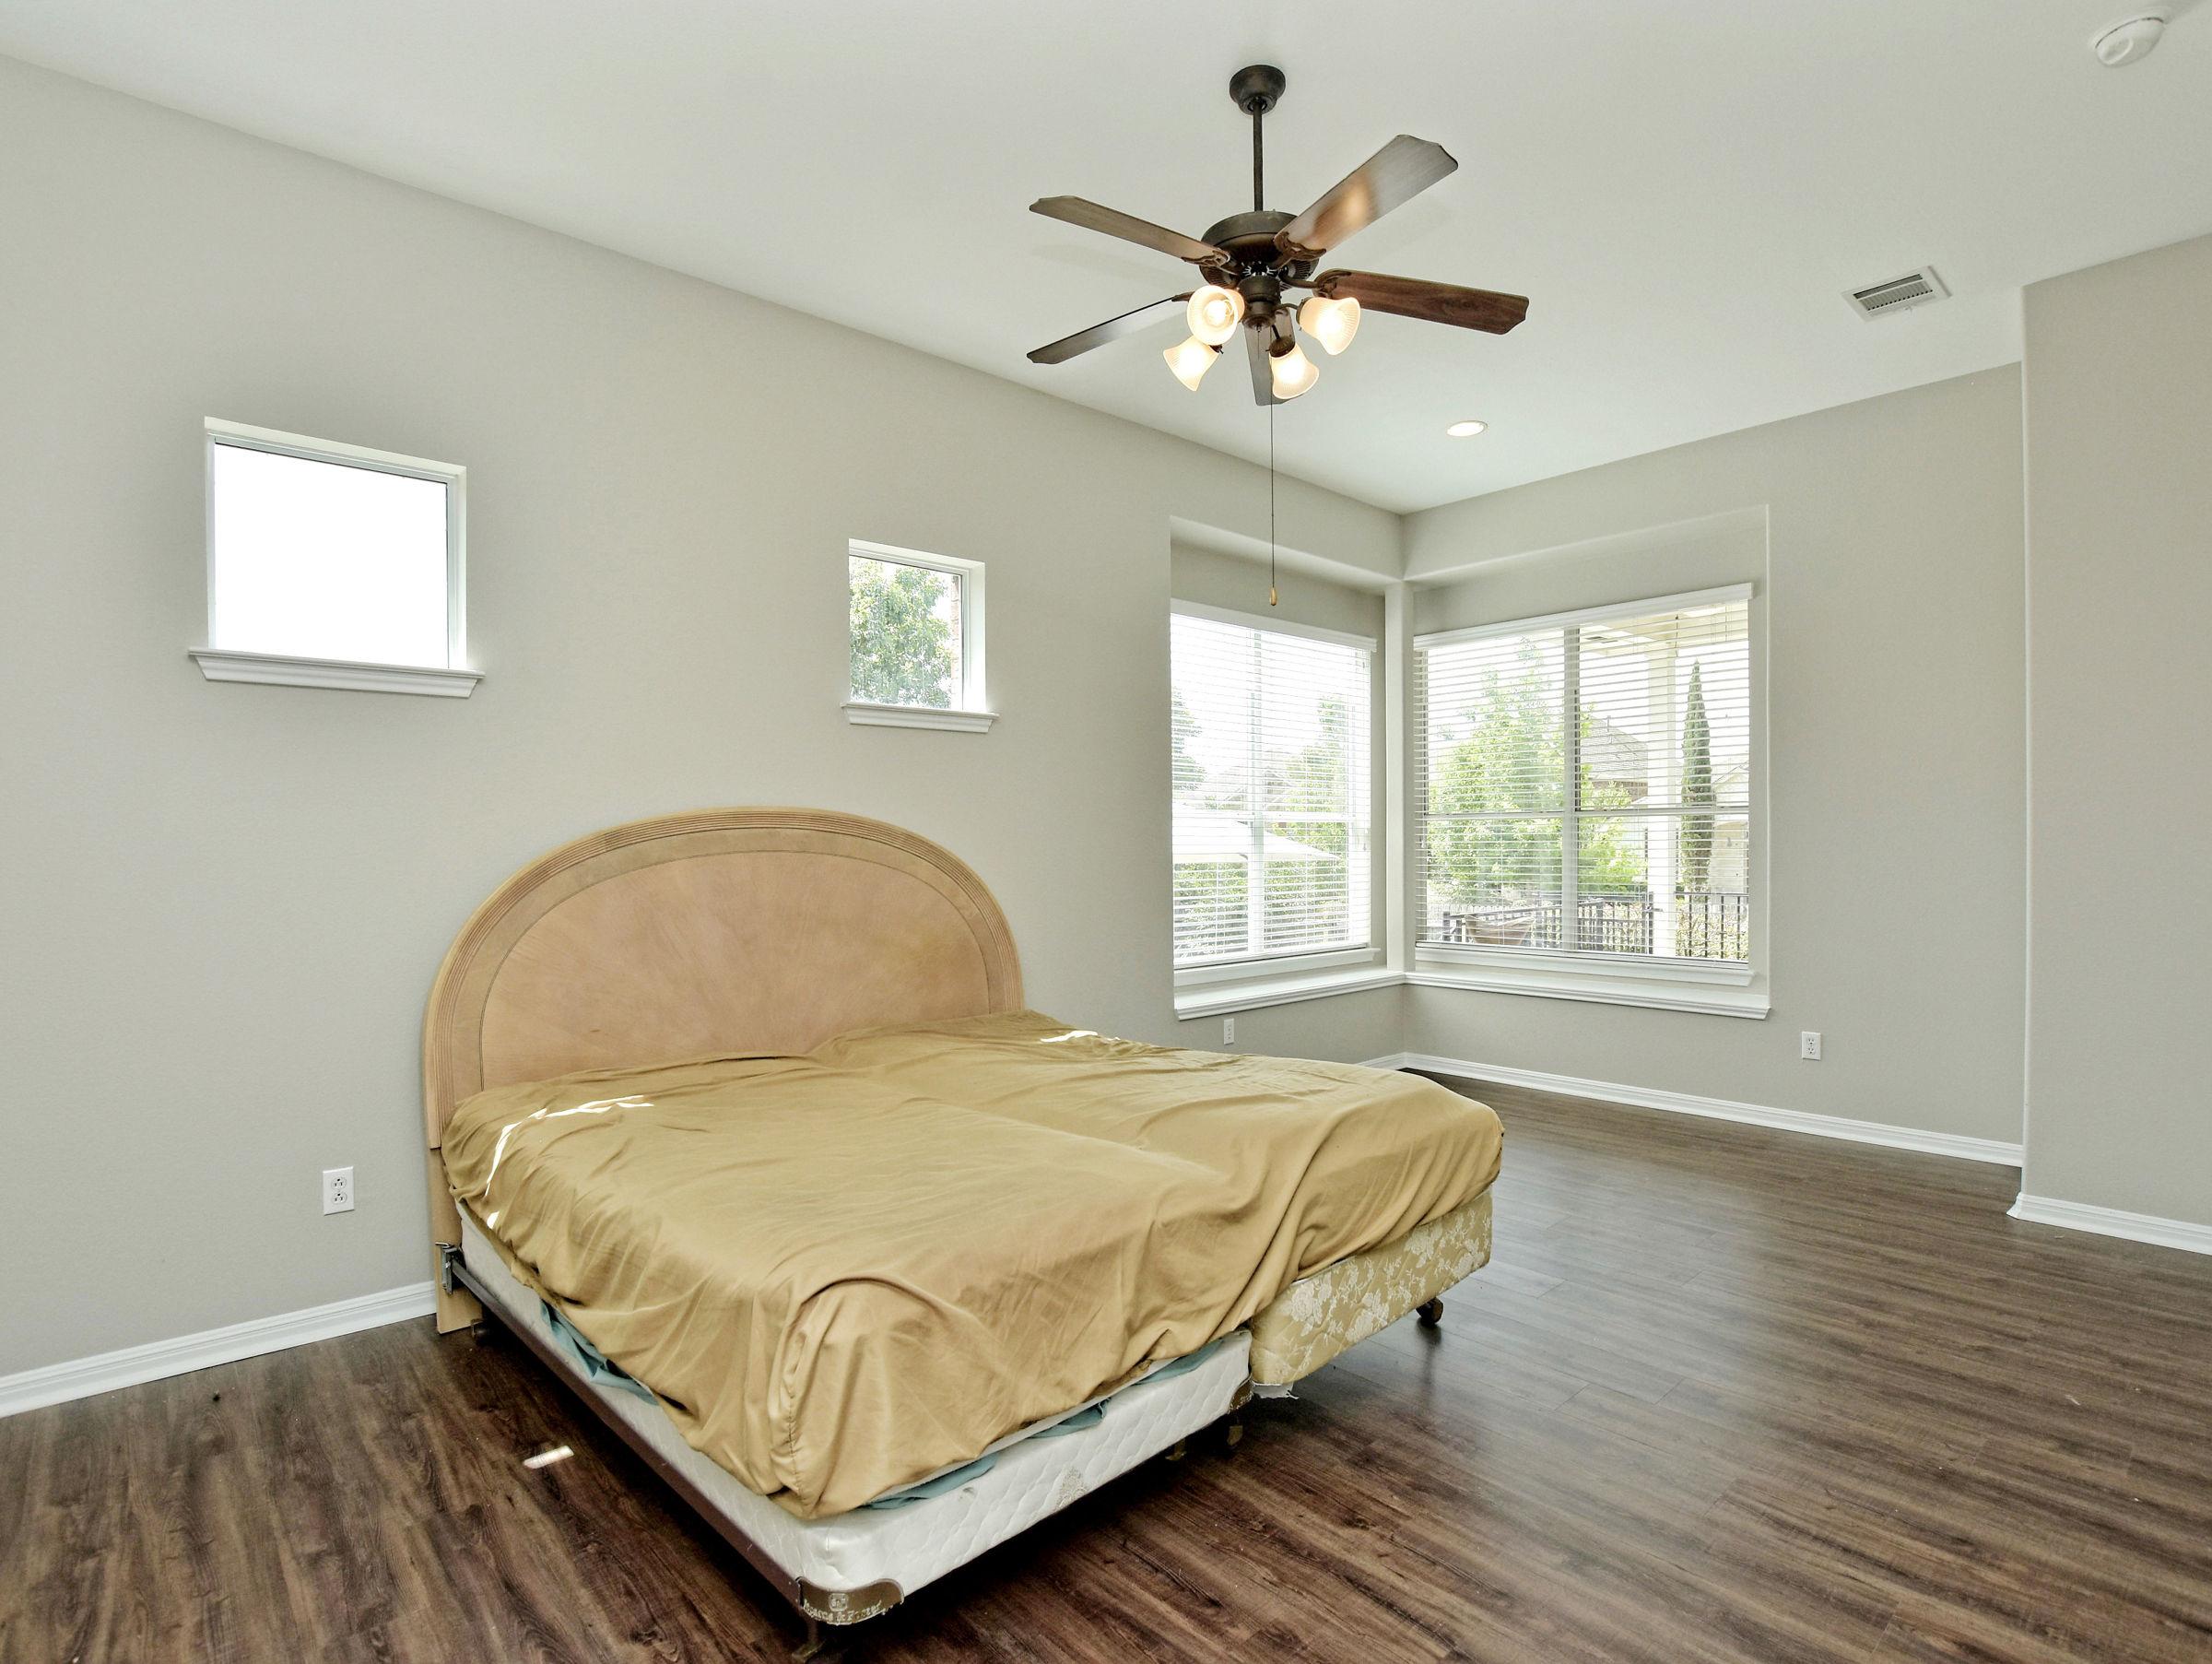 Bedroom - Existing Furniture